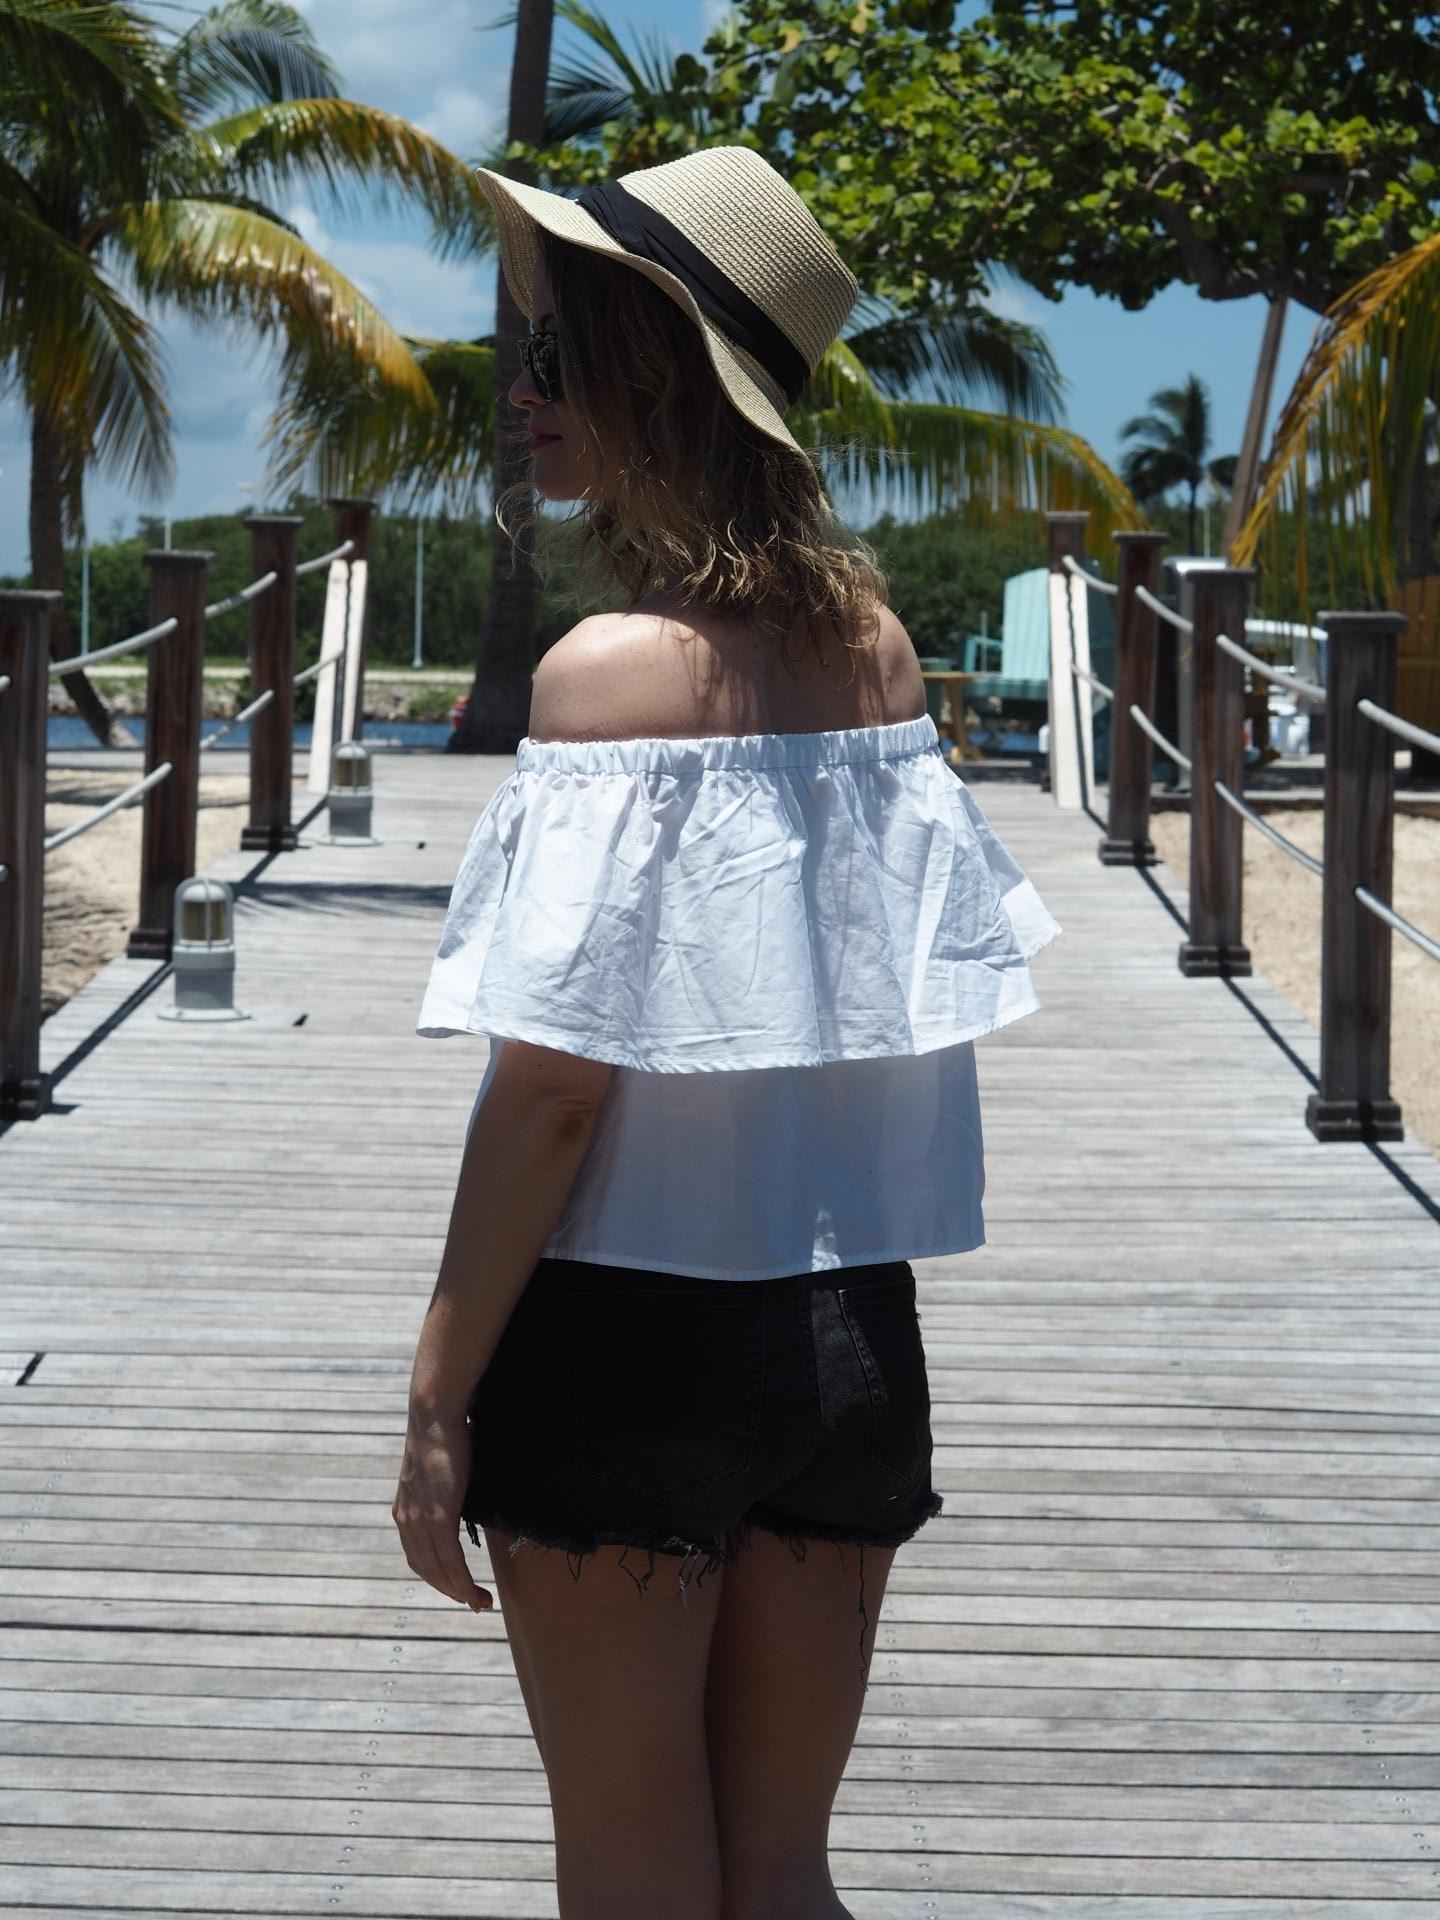 Cayman Brac - Le Soleil d'Or Cayman Islands - Photo Tutorial by Jamie 10